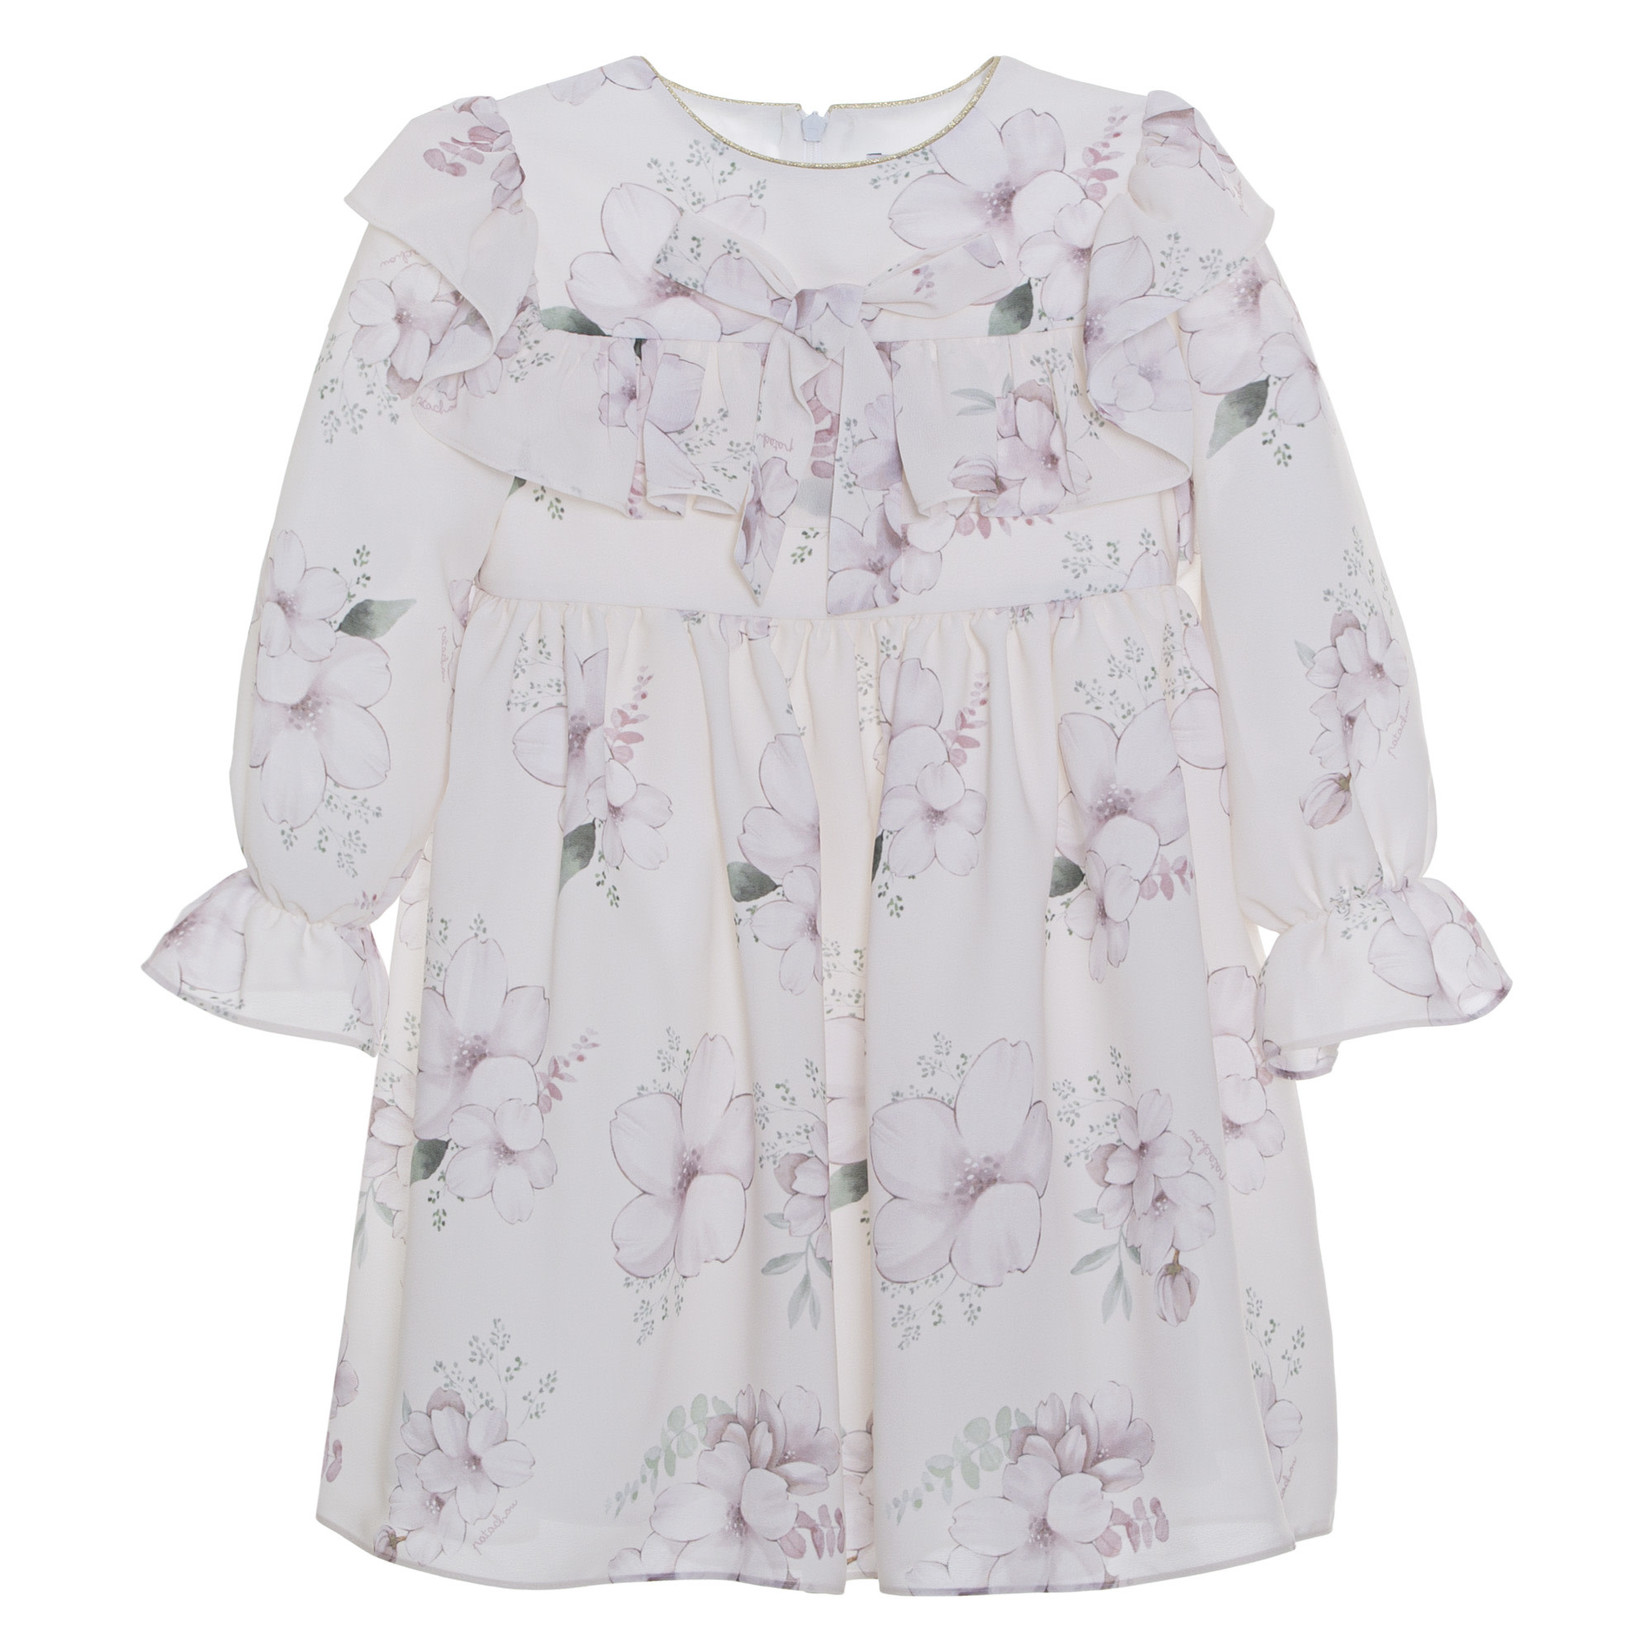 Patachou Dress Floral - Patachou